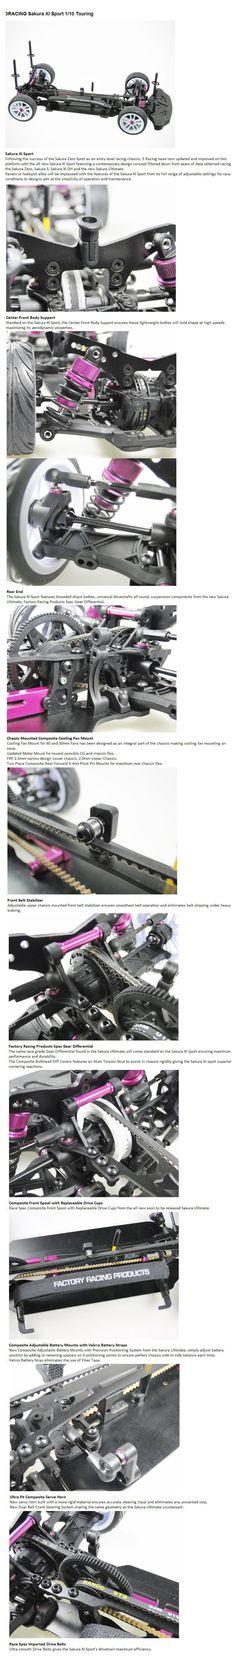 3Racing Sakura XI Sport 1/10 RC Touring Car for R/C or RC - Team Integy